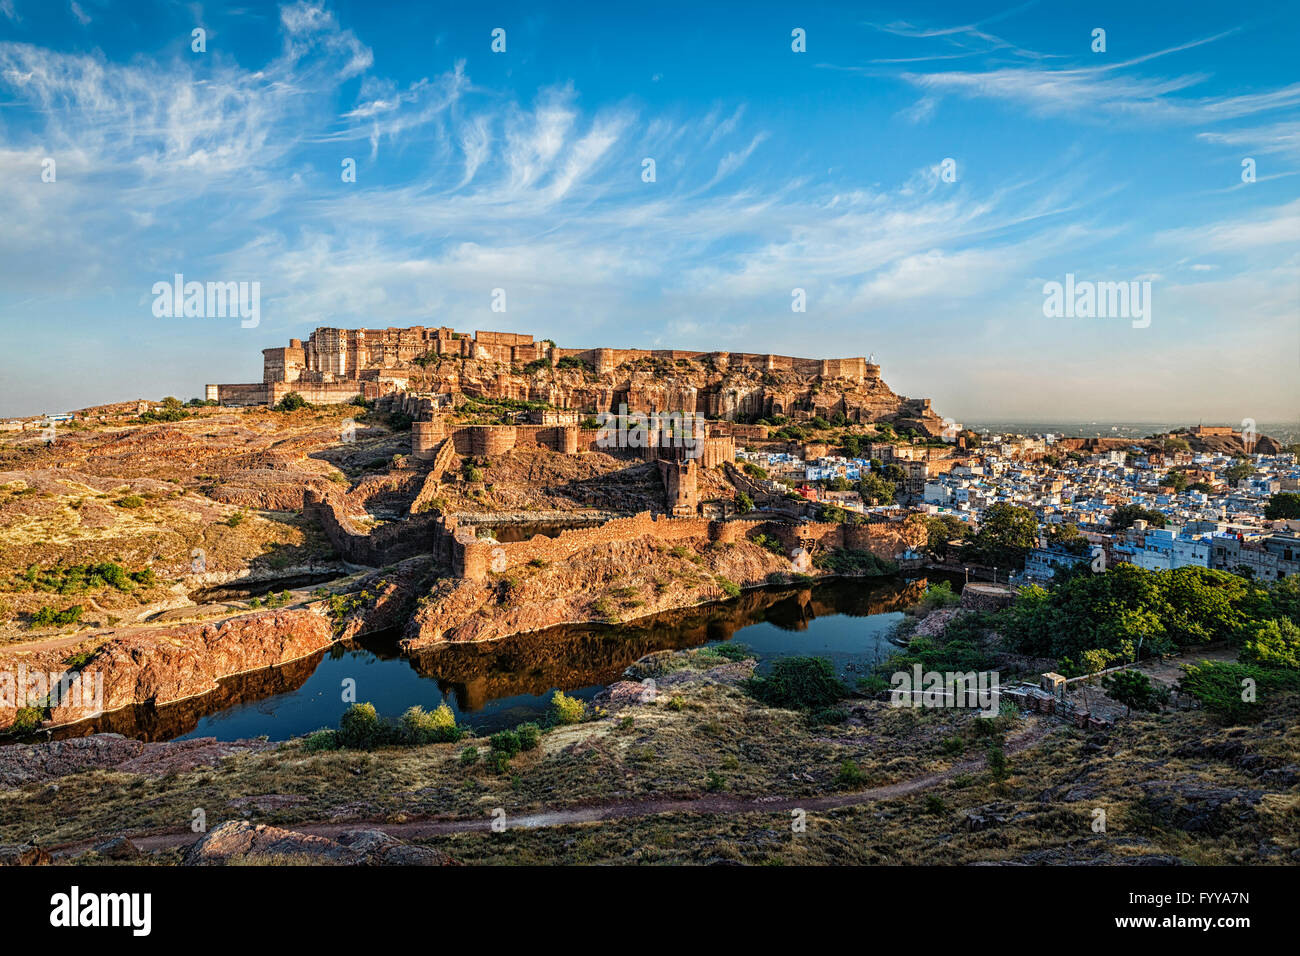 Mehrangarh Fort, Jodhpur, Rajasthan, India - Stock Image